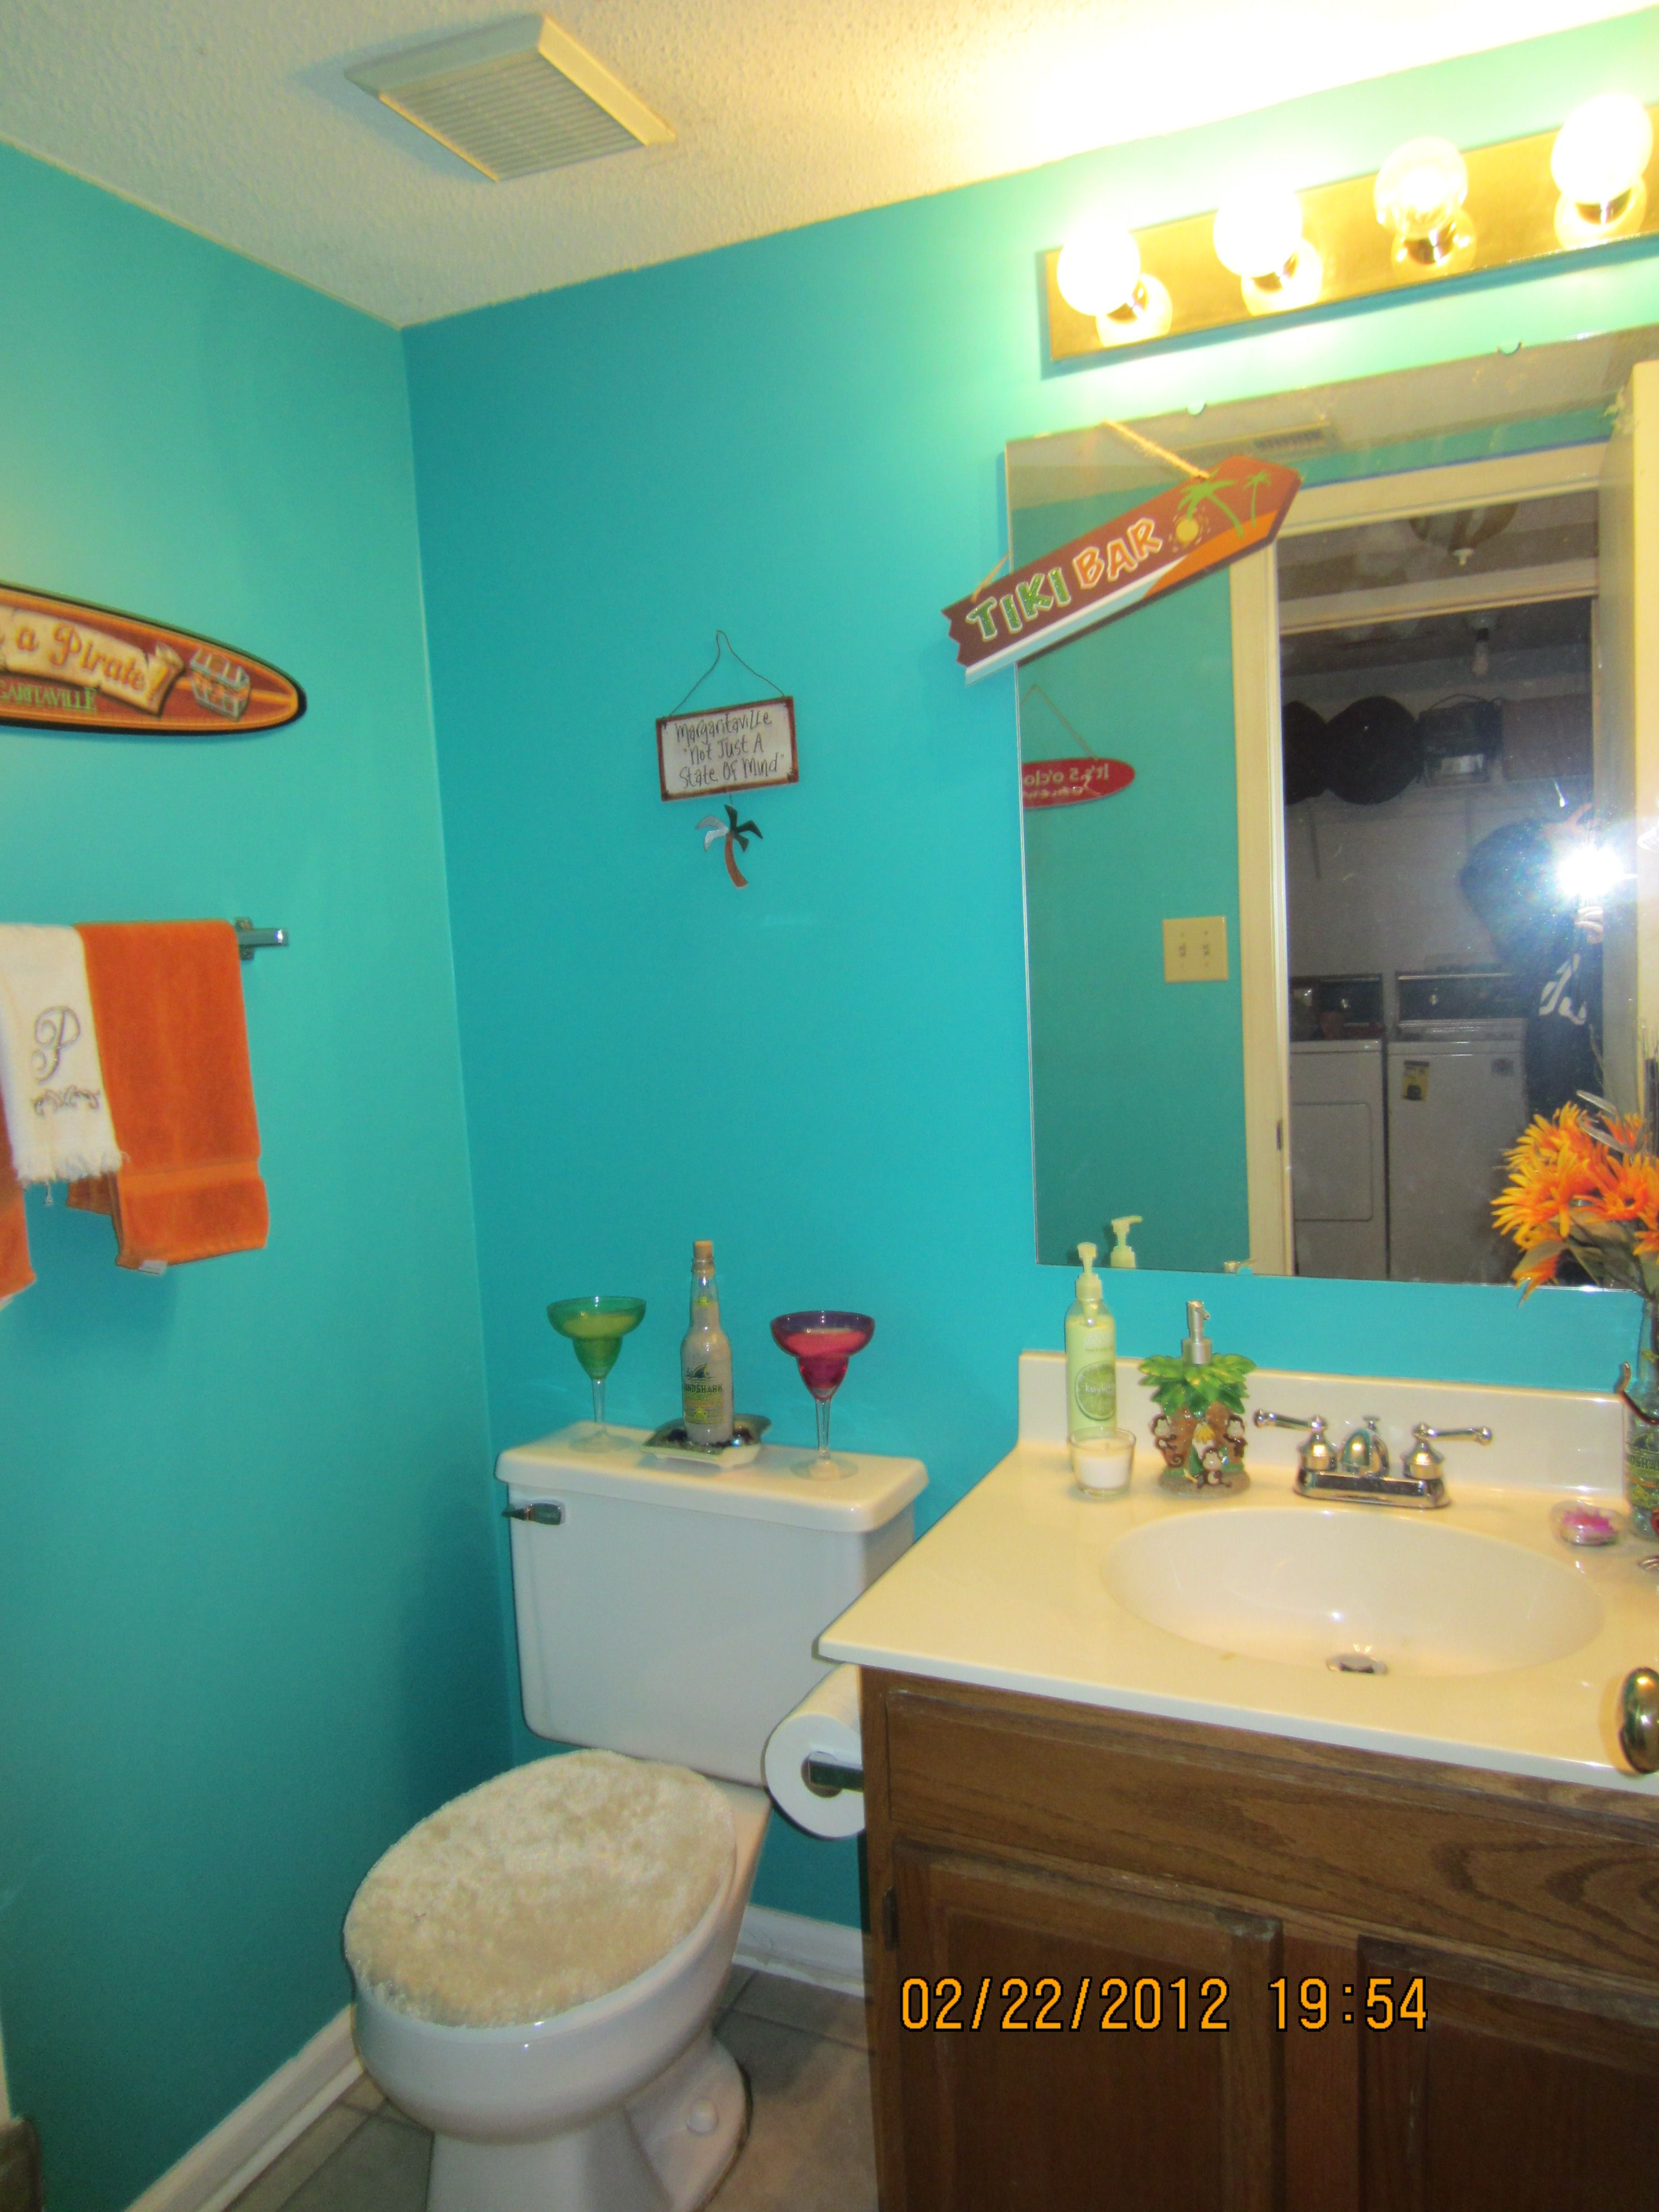 Margaritaville Themed Bathroom. Decorate